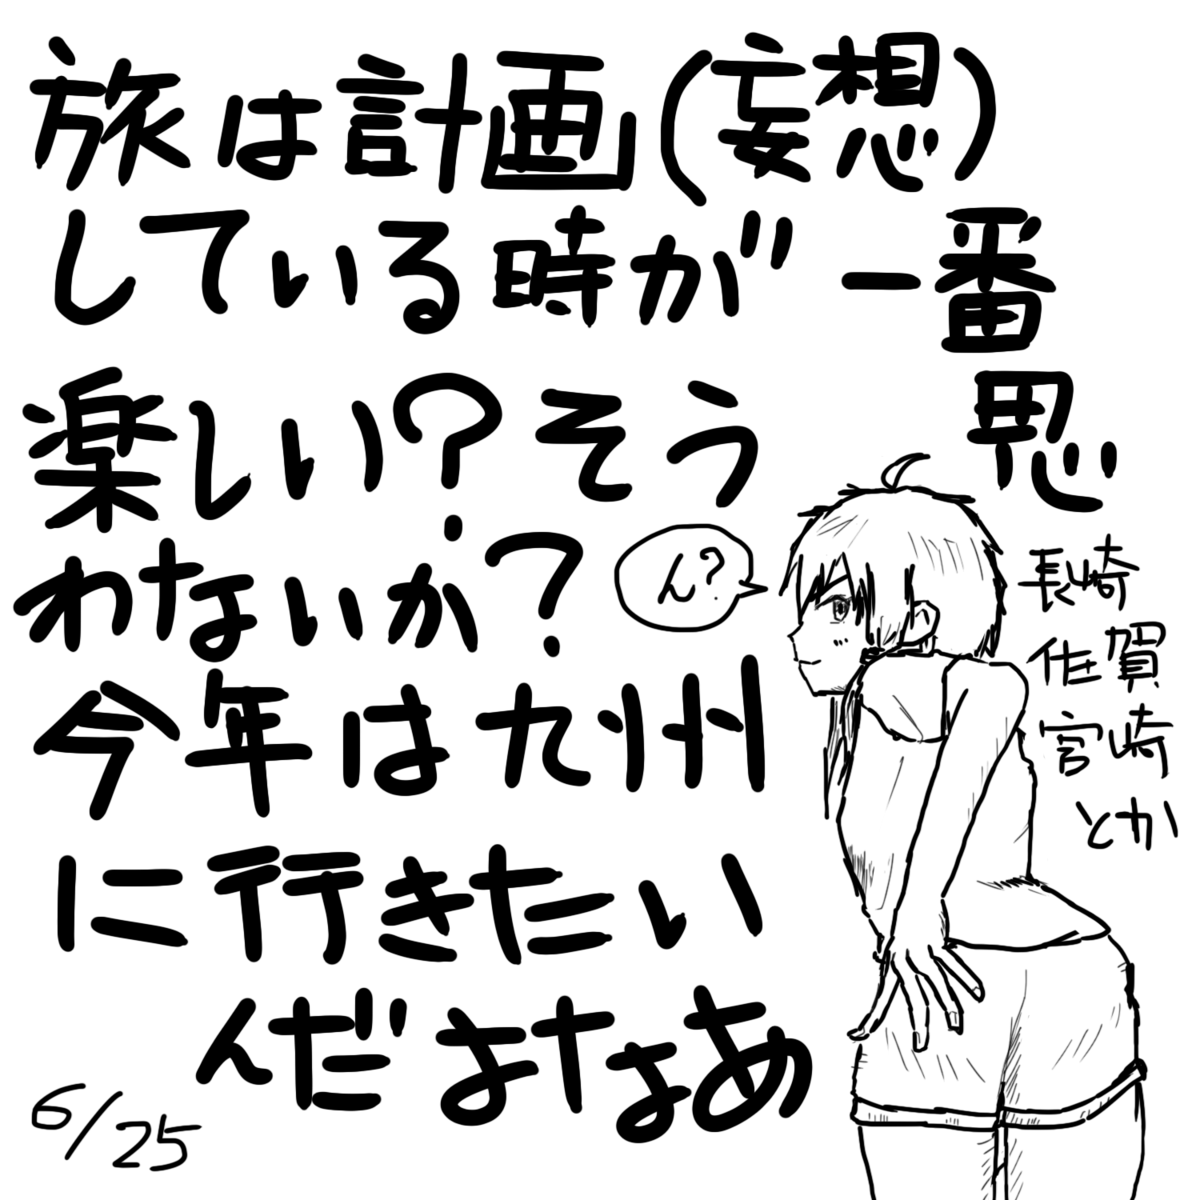 f:id:zomuzomu:20200625135136p:plain